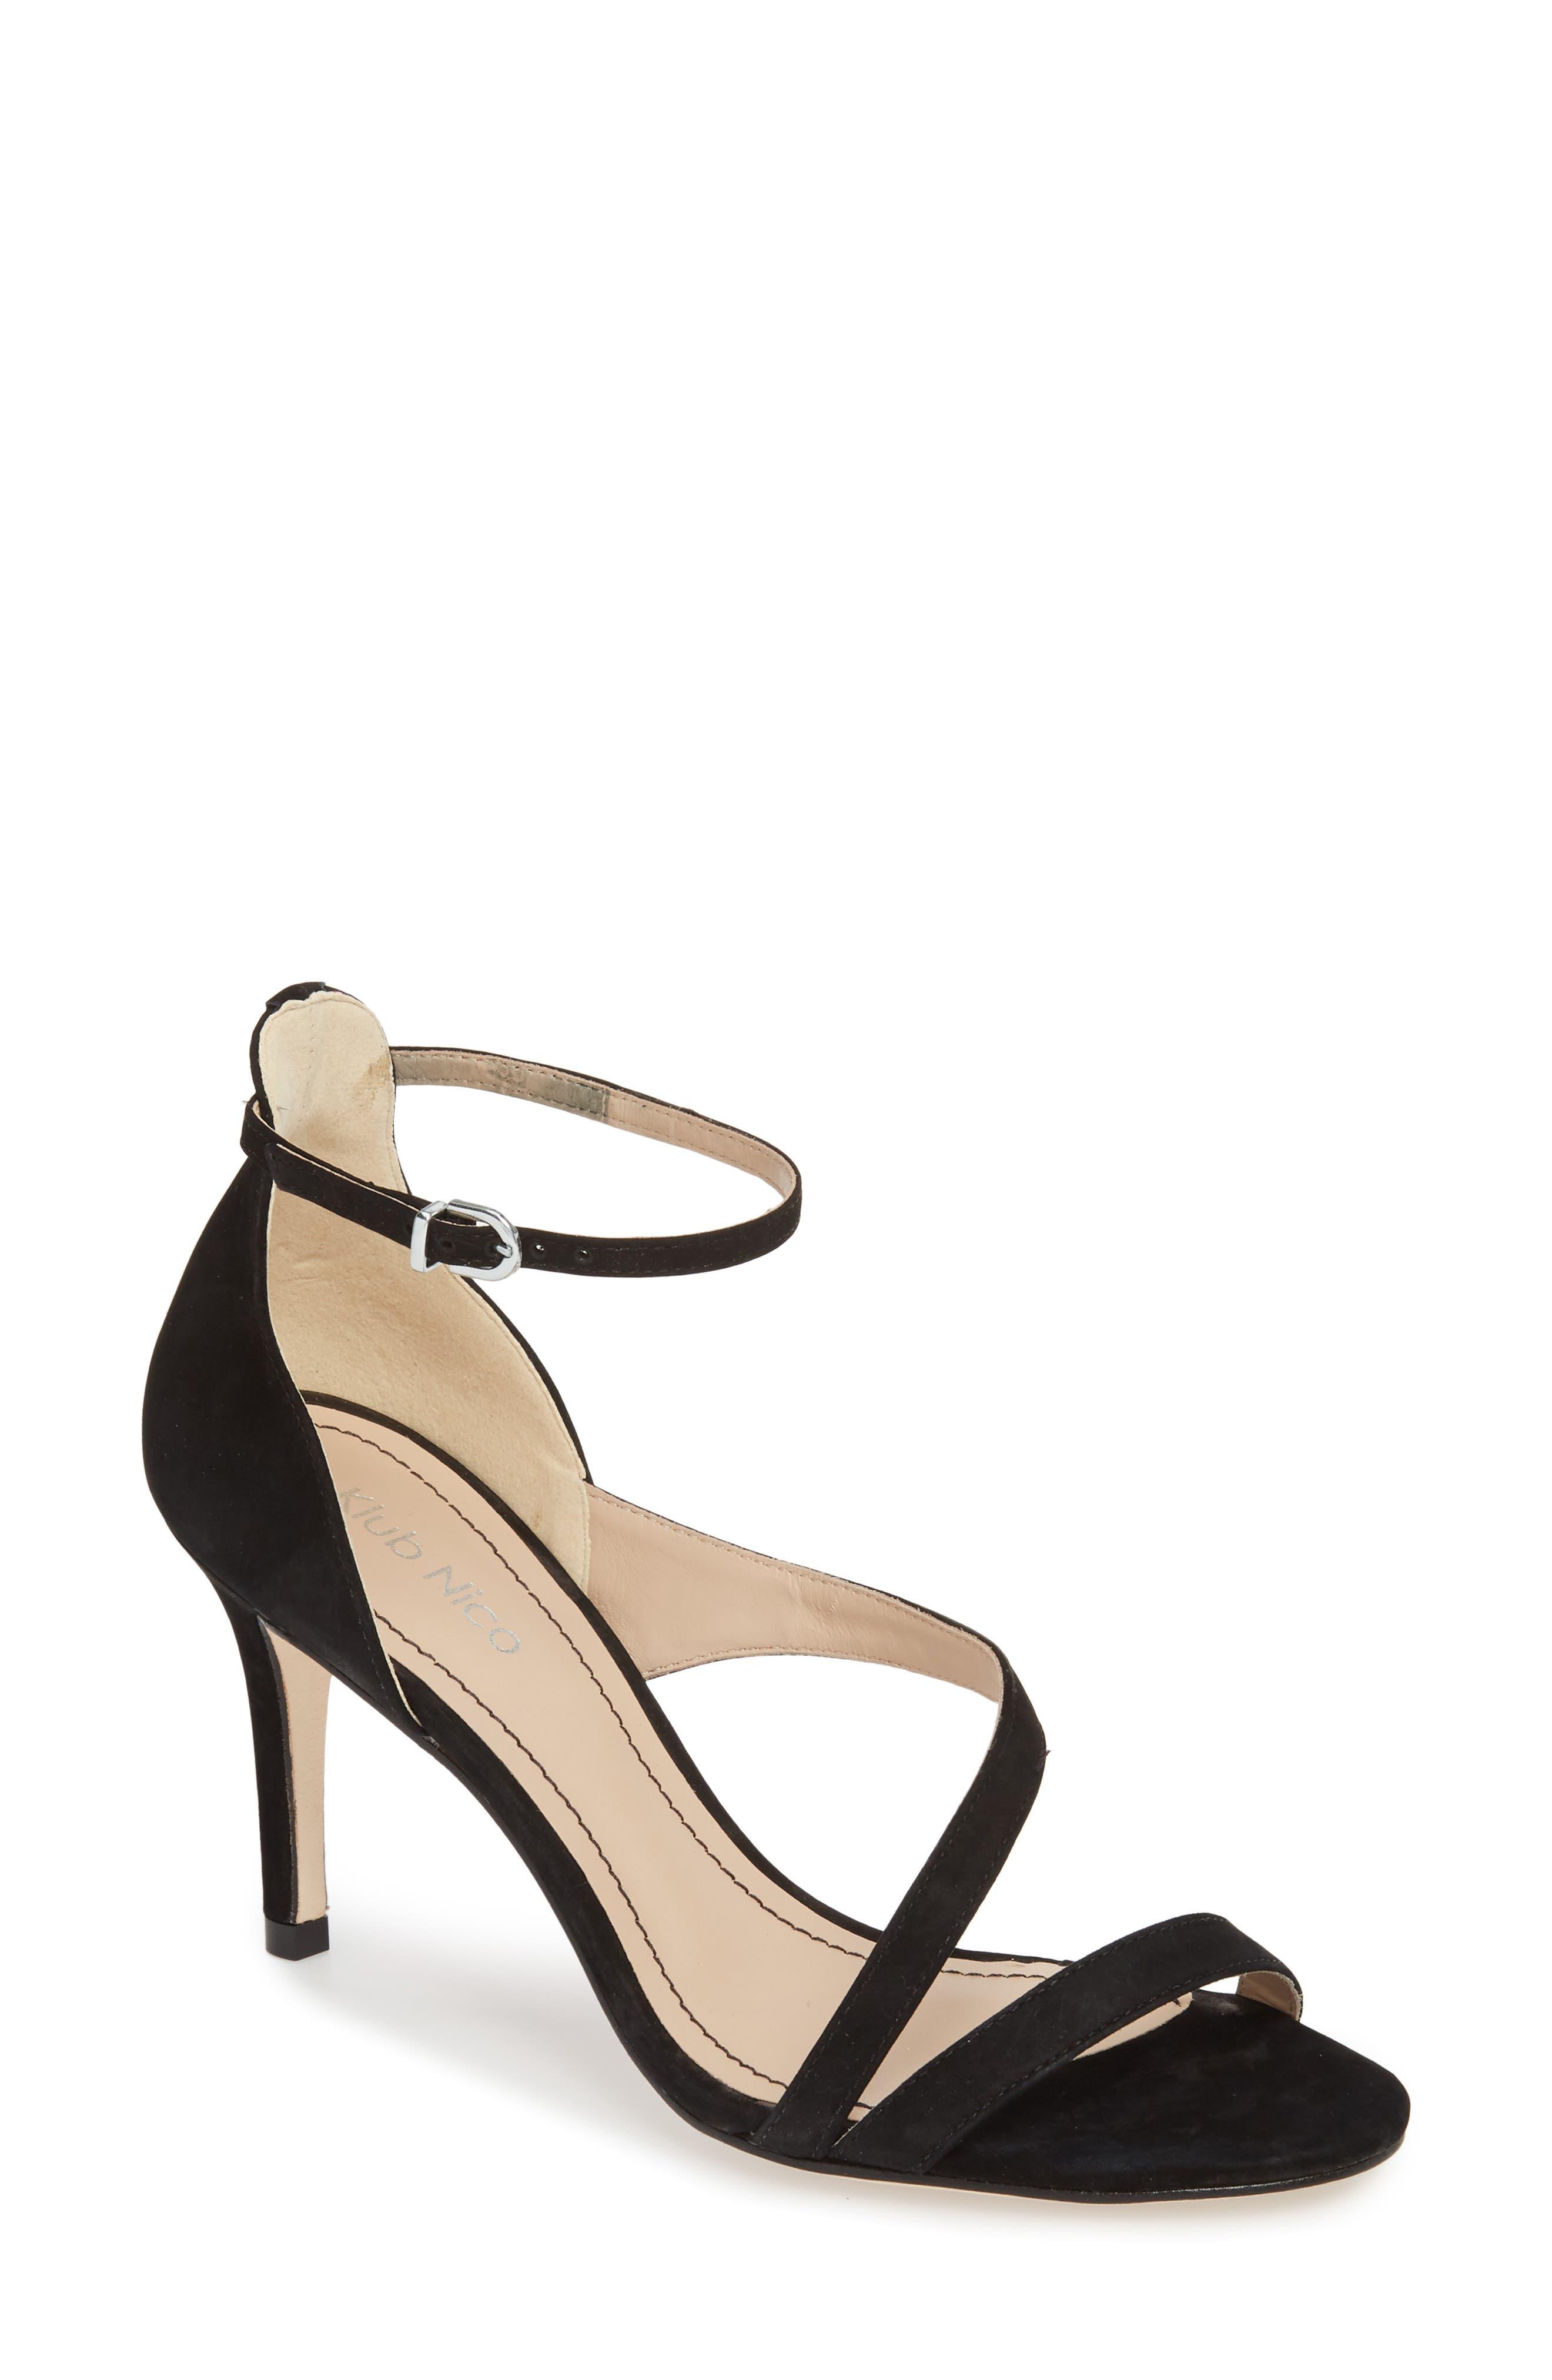 Aleda Sandal,                         Main,                         color, BLACK NUBUCK LEATHER